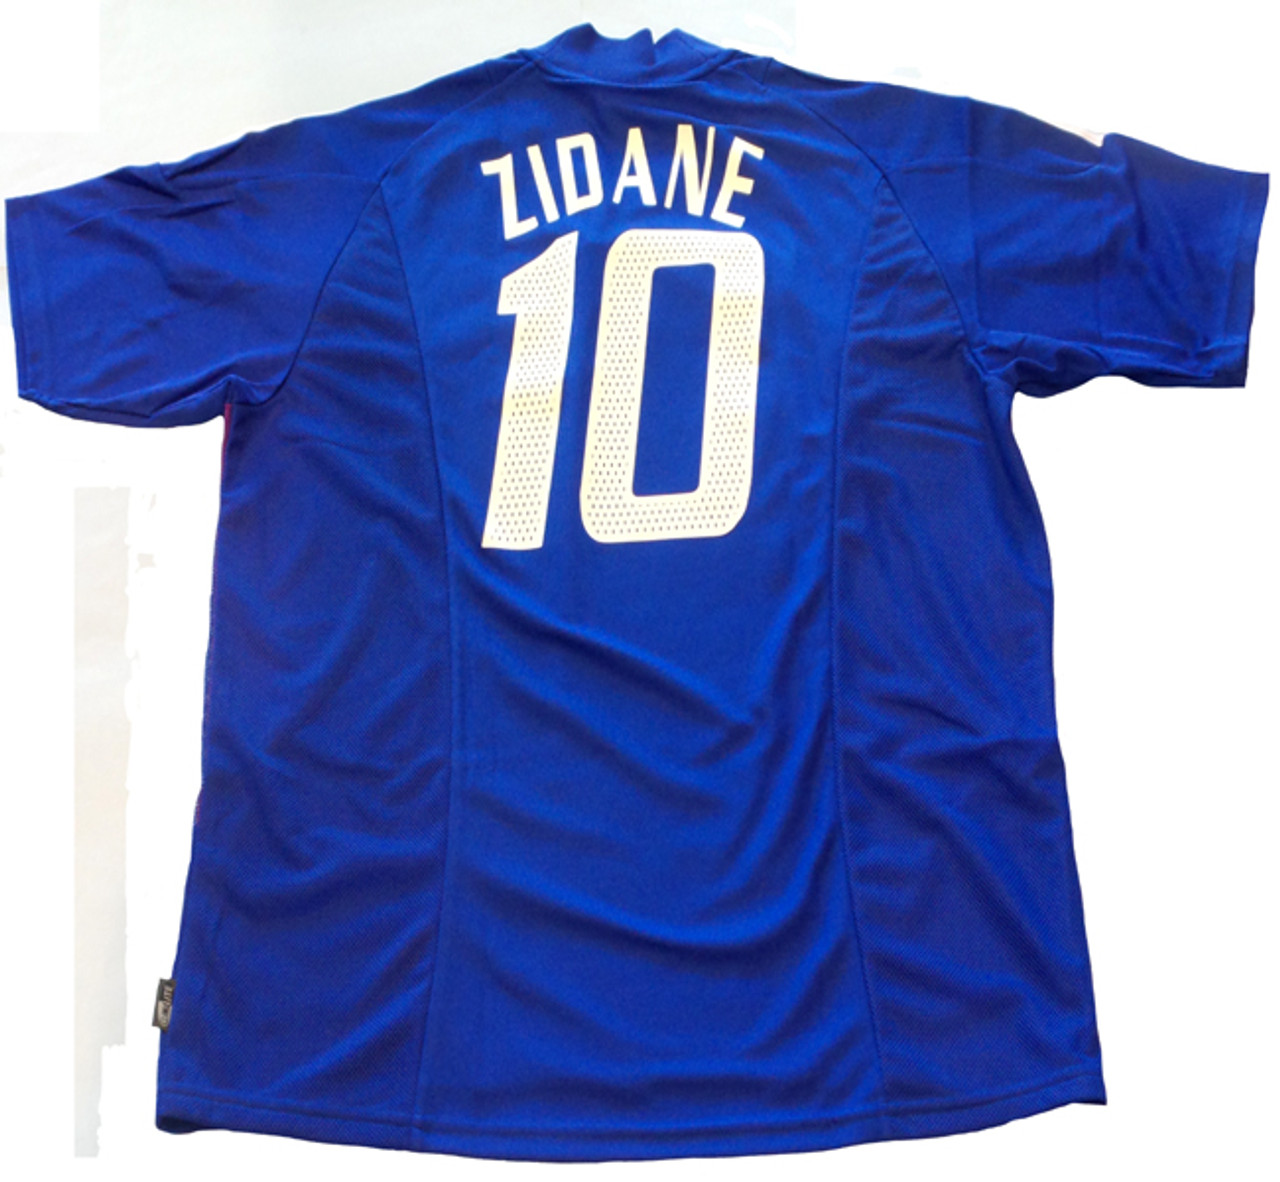 Adidas France 2002 Zidane Home Jersey Soccer Plus